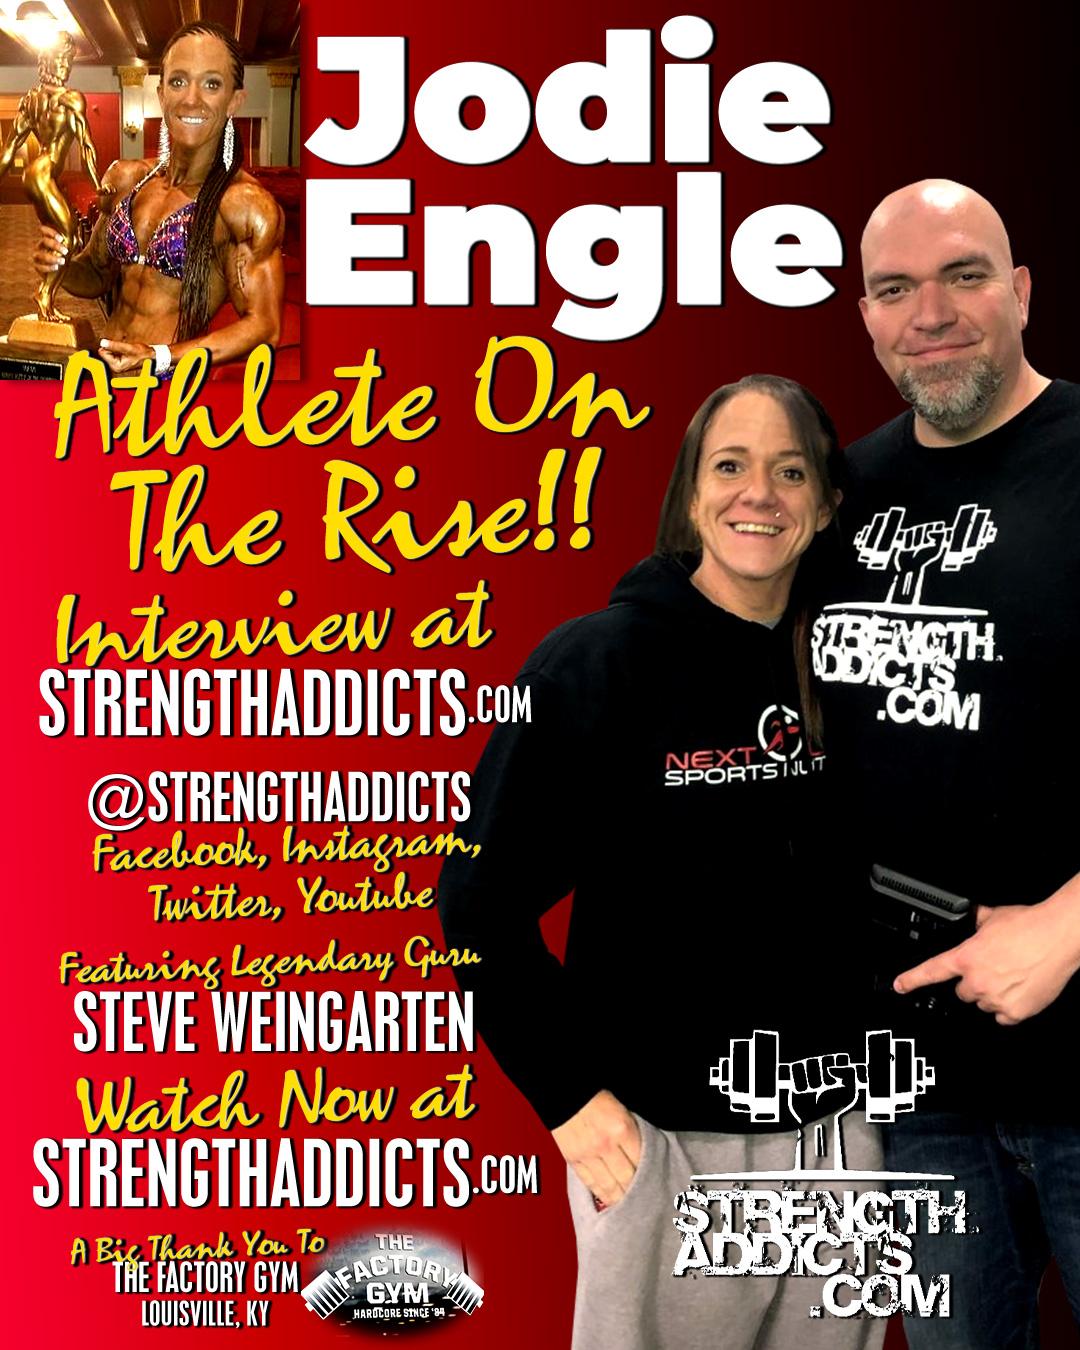 Jodie Engle + Steve Weingarten